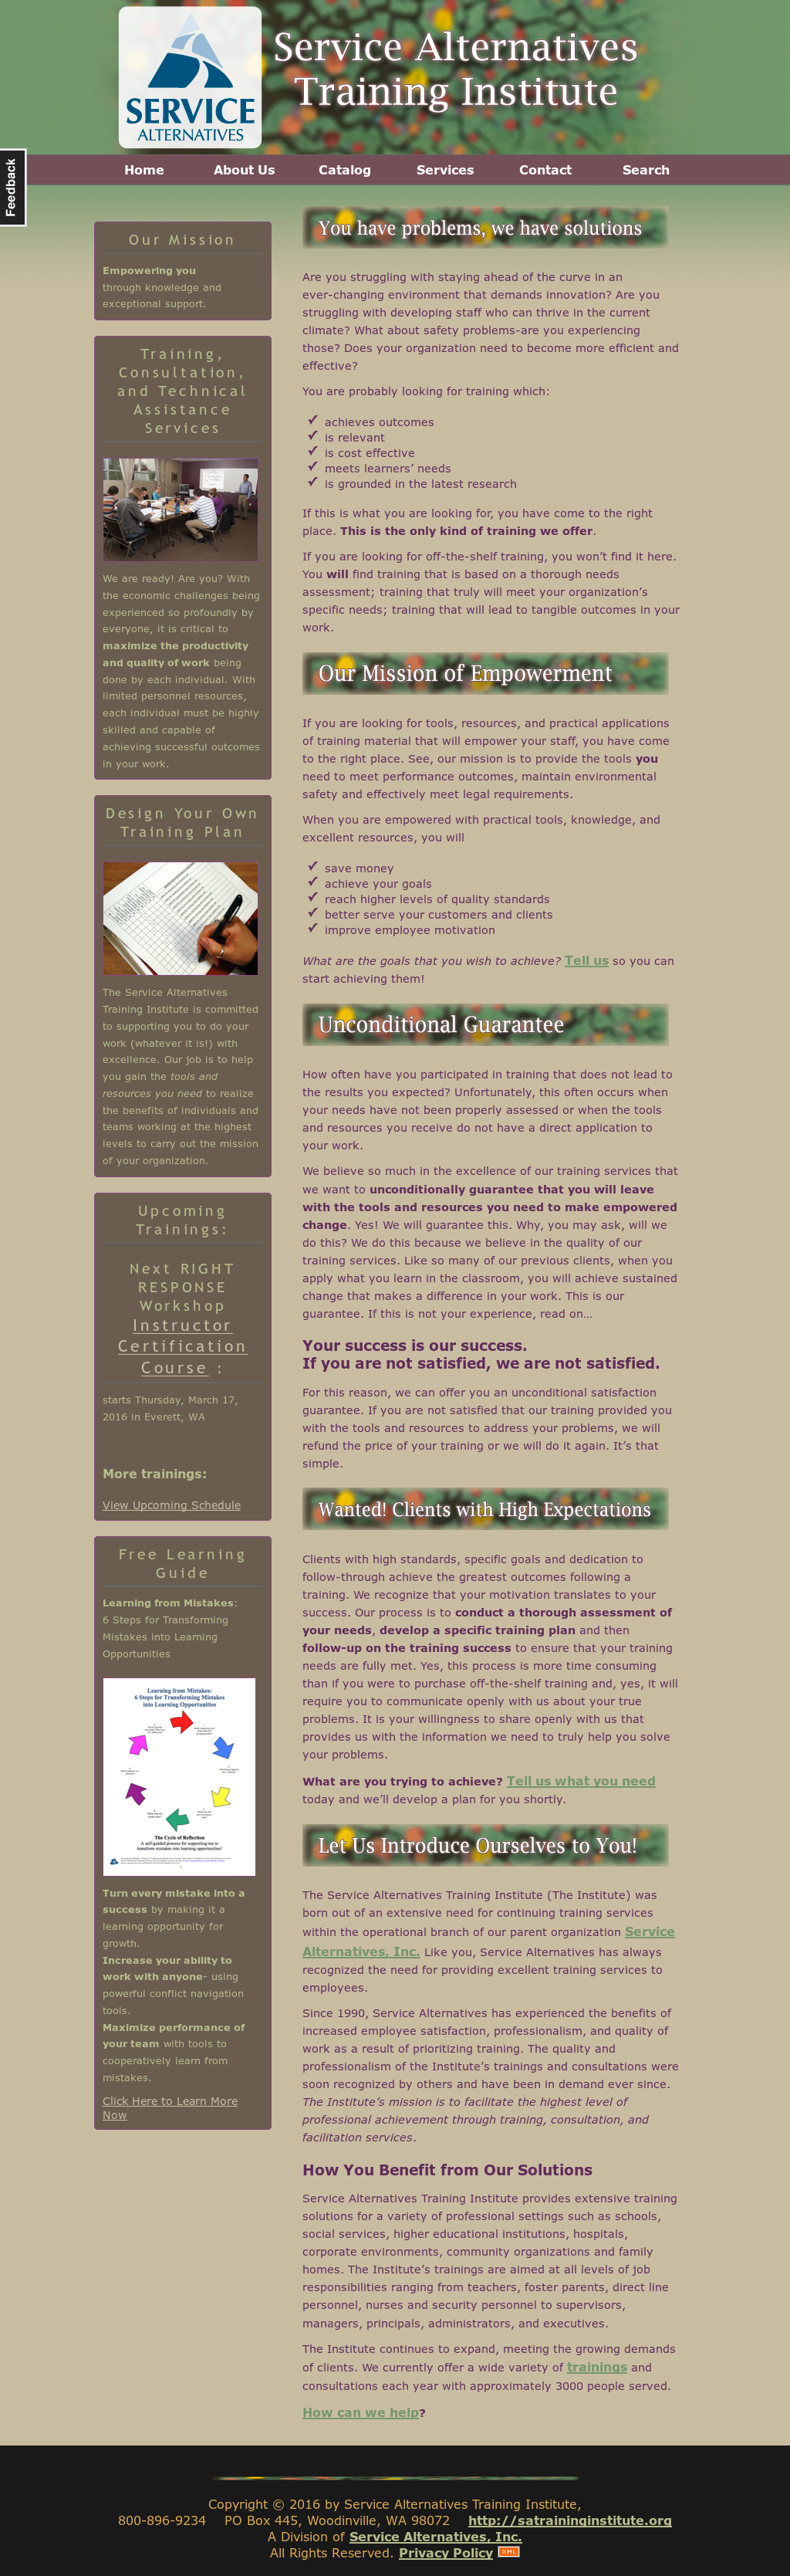 Belinda Kindschi Competitors, Revenue and Employees - Owler